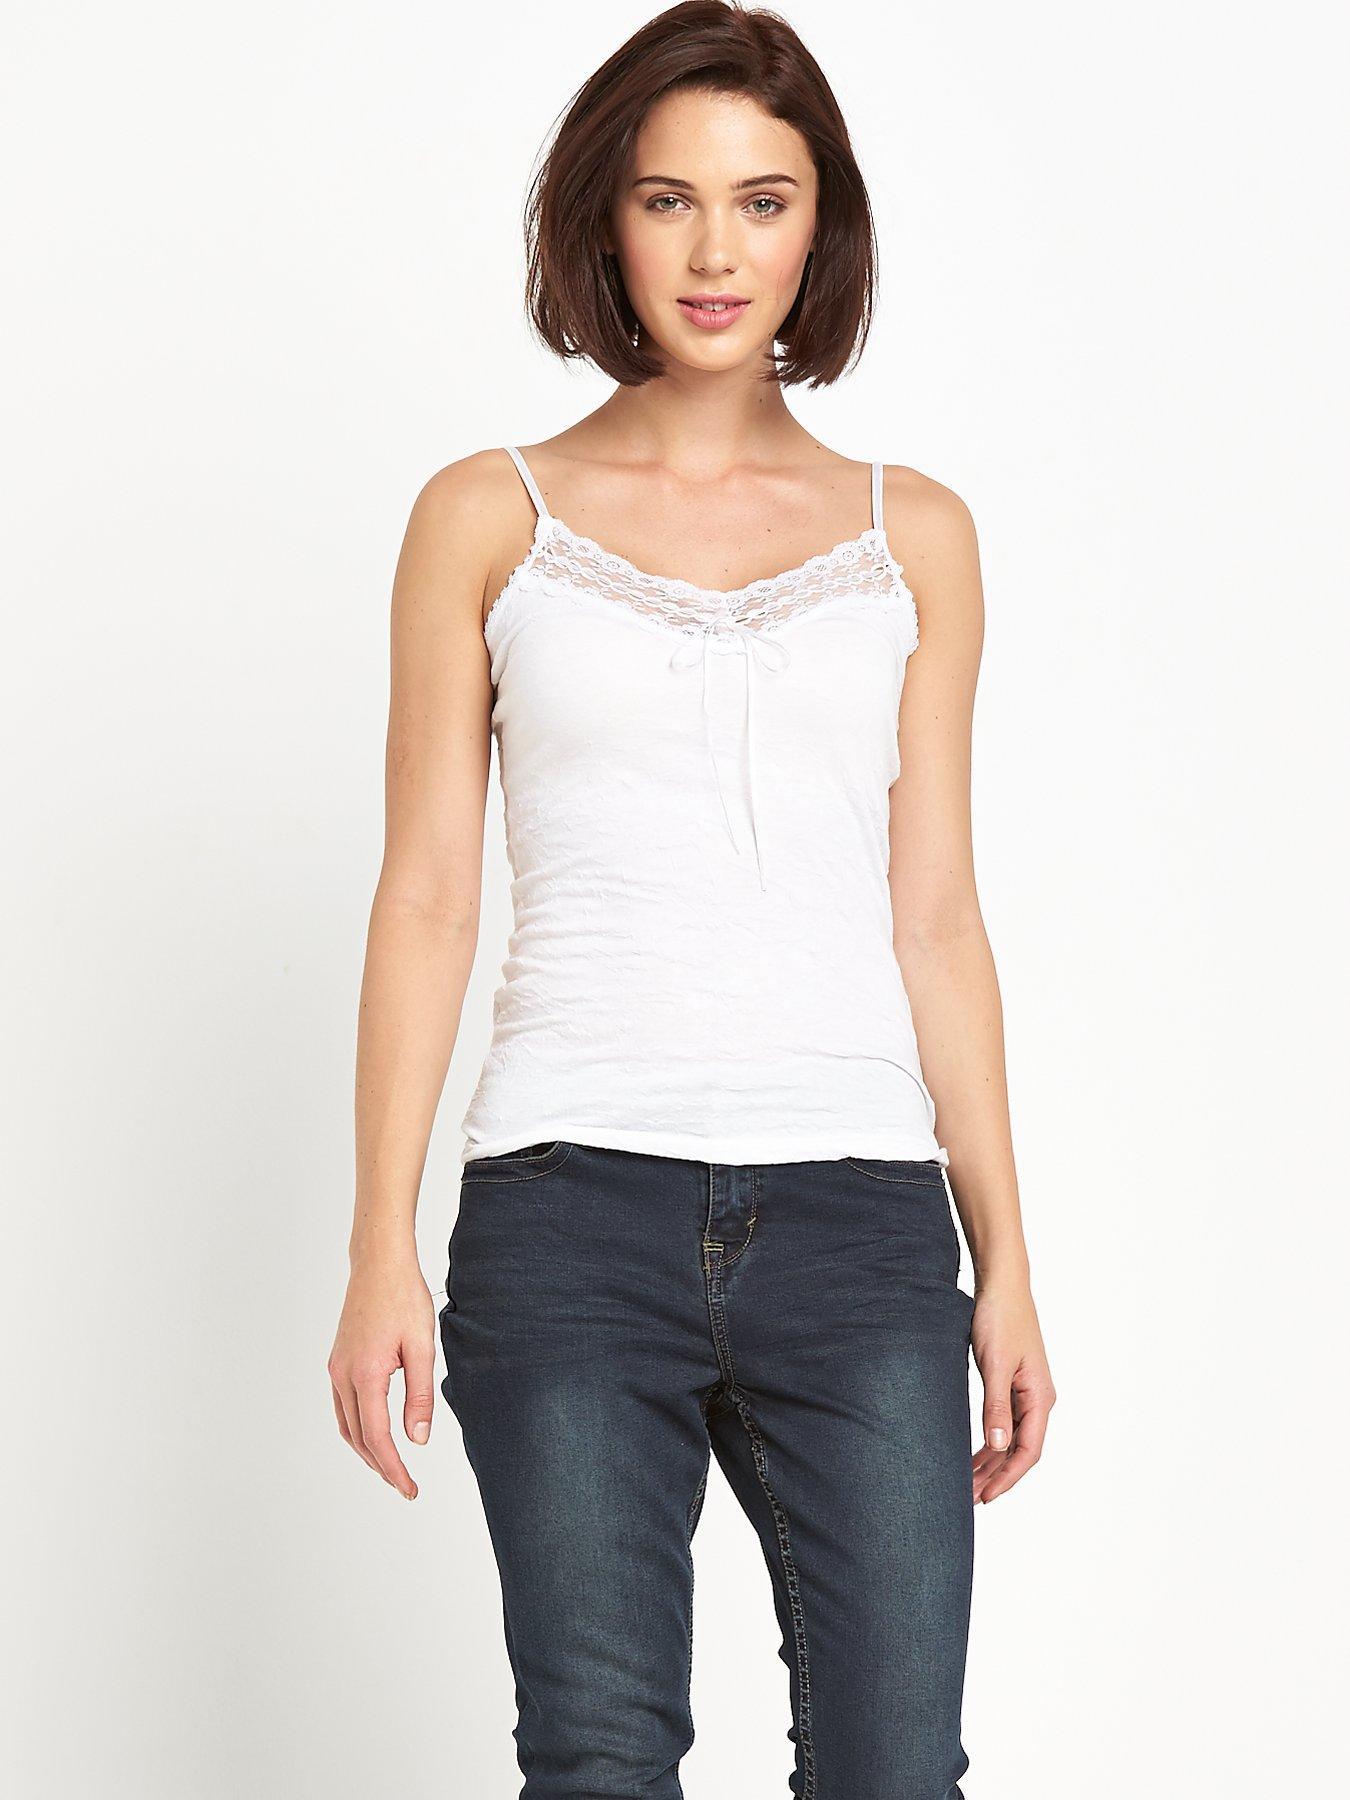 Vibrant Versatile Cami - White, White